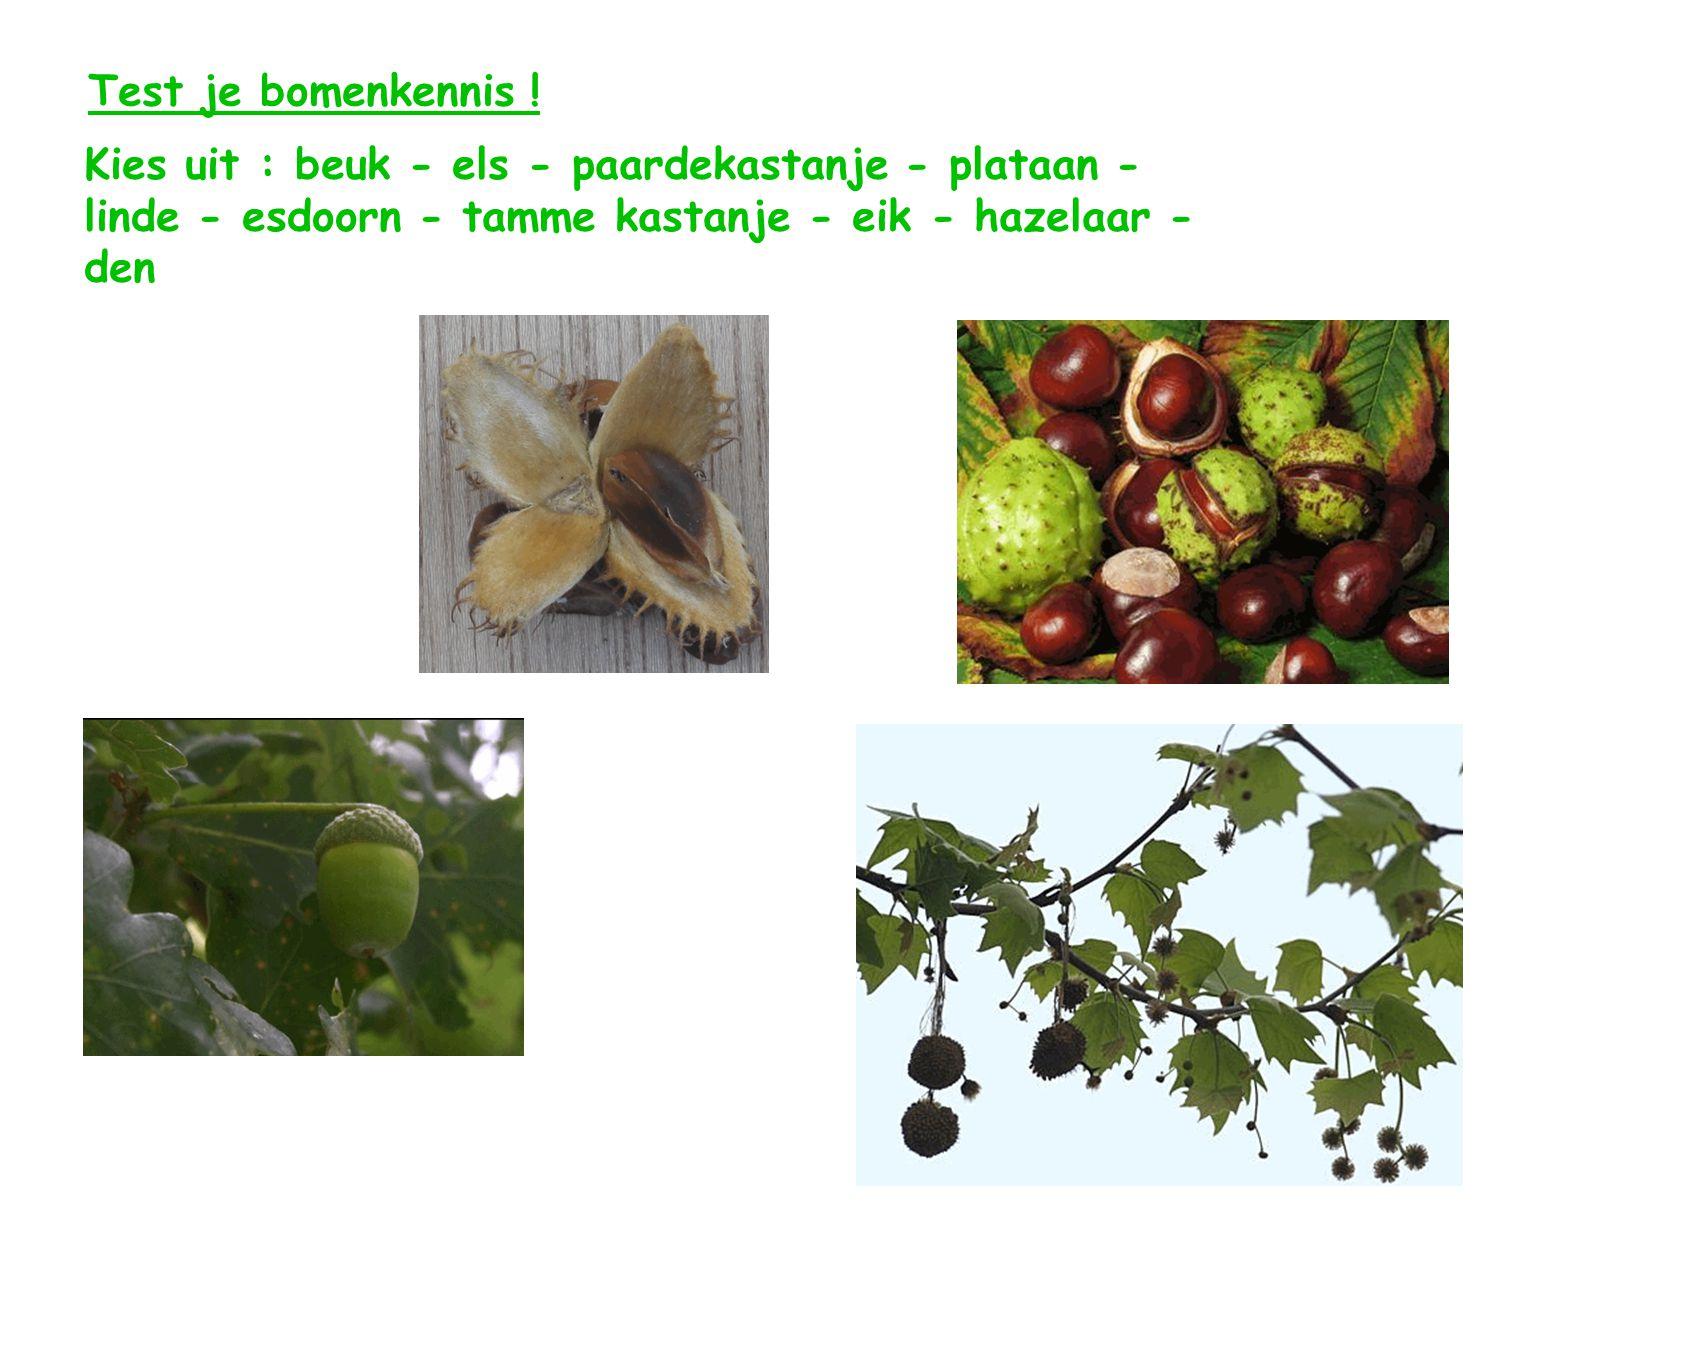 Test je bomenkennis ! Kies uit : beuk - els - paardekastanje - plataan - linde - esdoorn - tamme kastanje - eik - hazelaar -